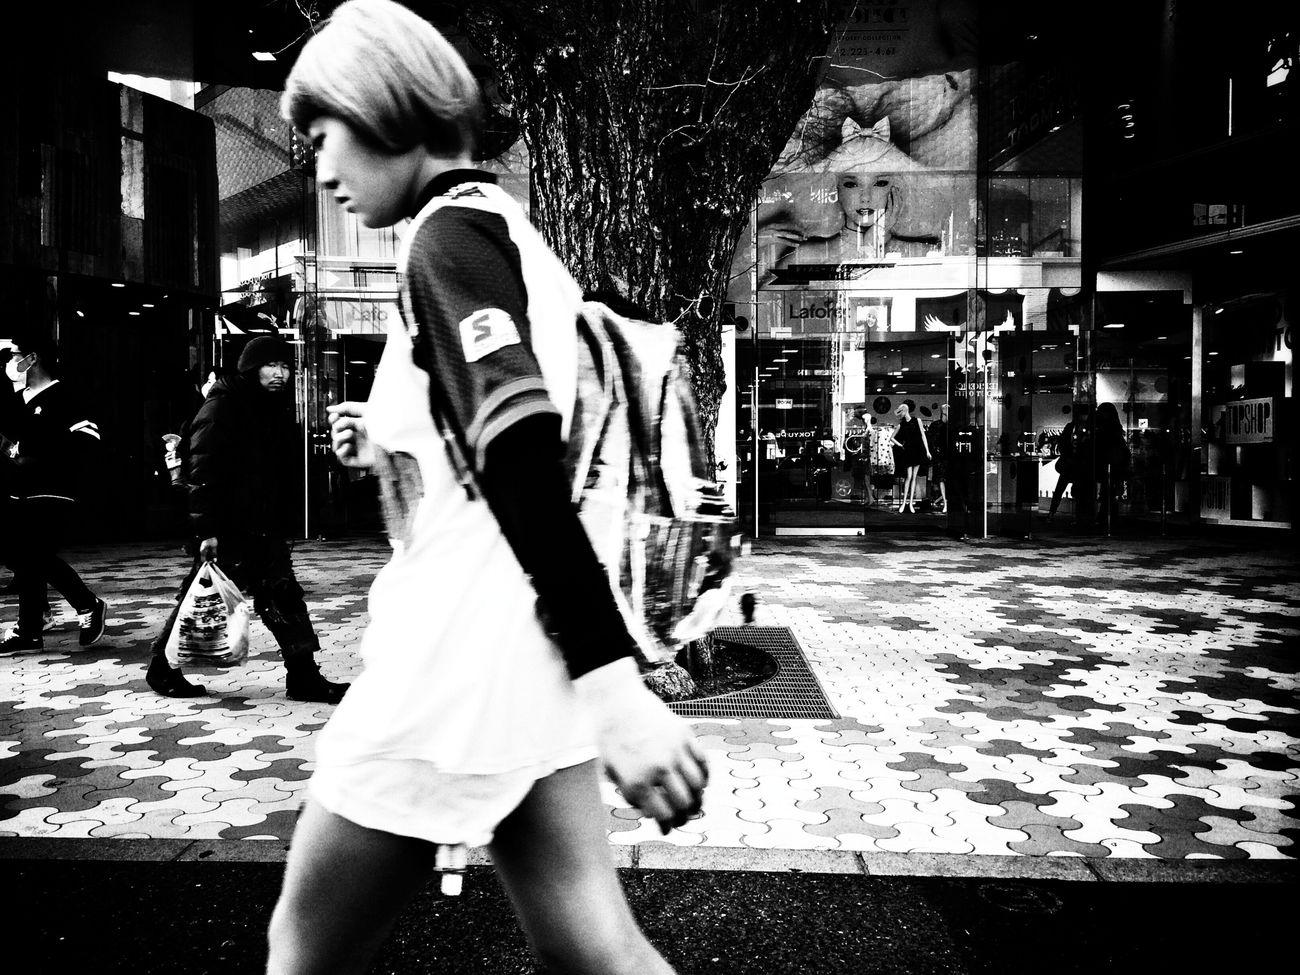 Candid Tokyo Candid Streetphotography Blackandwhite Photography Tokyo